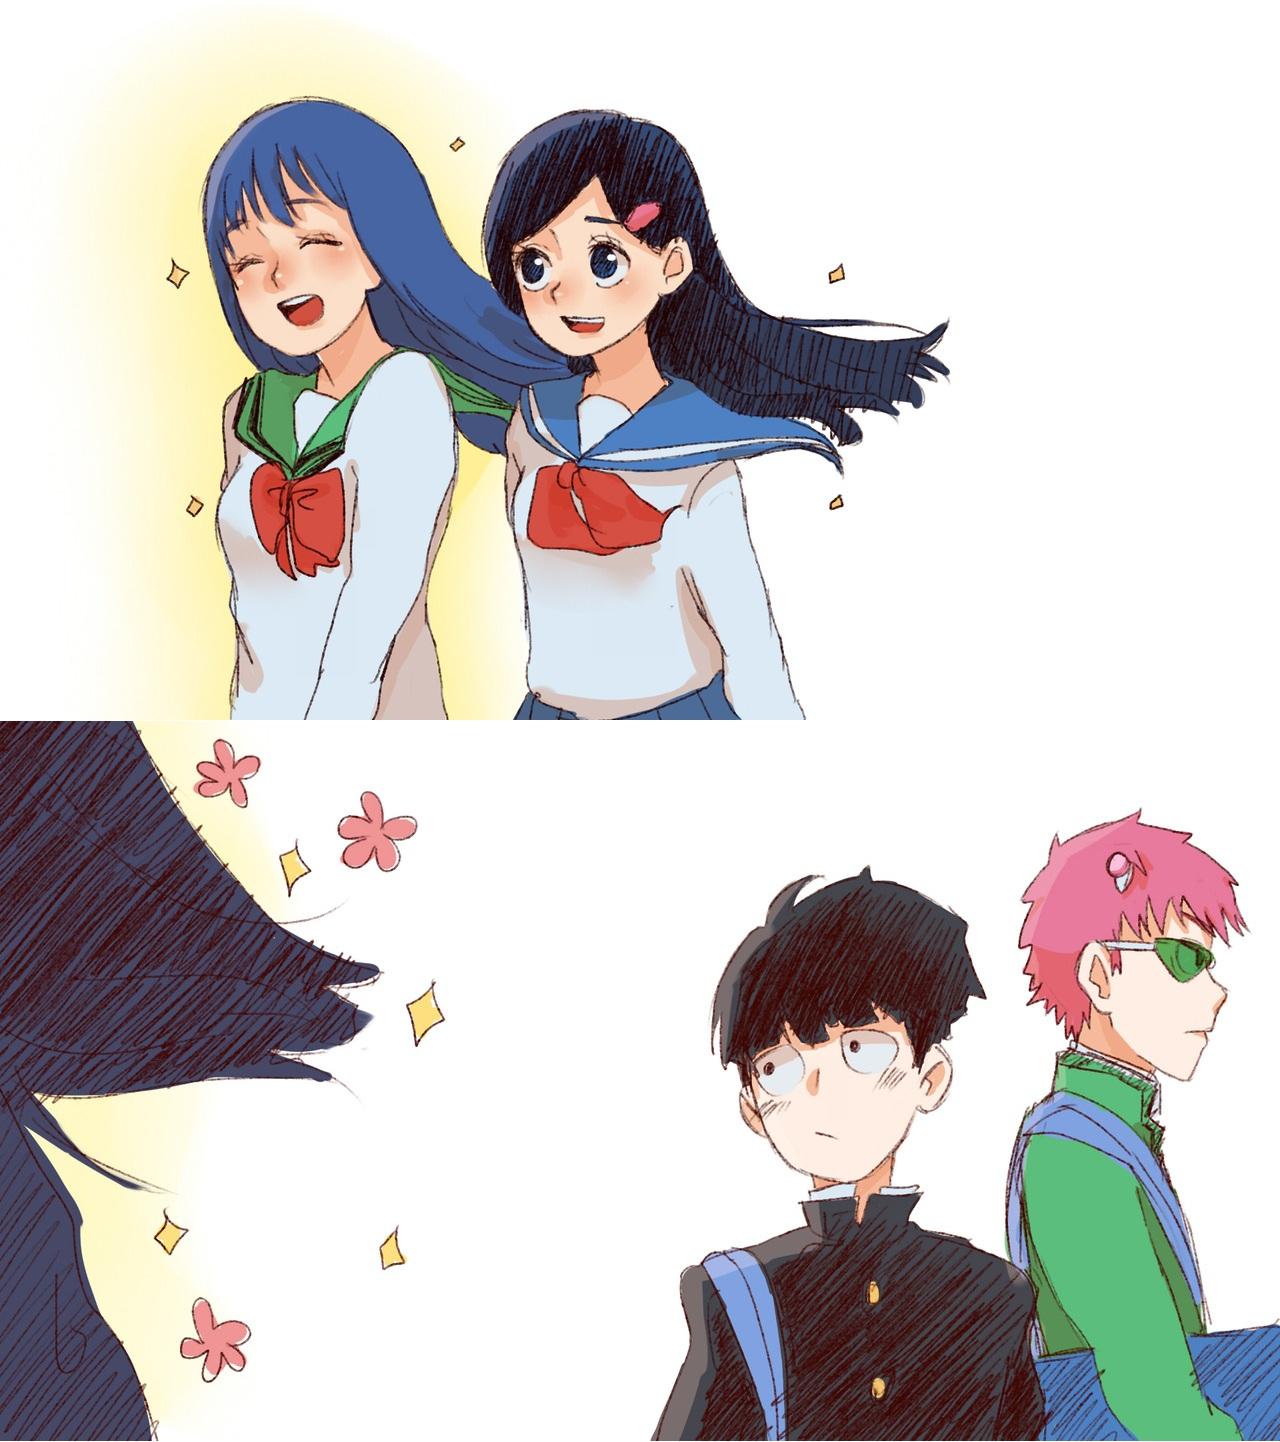 Inversion Anime Manga Know Your Meme